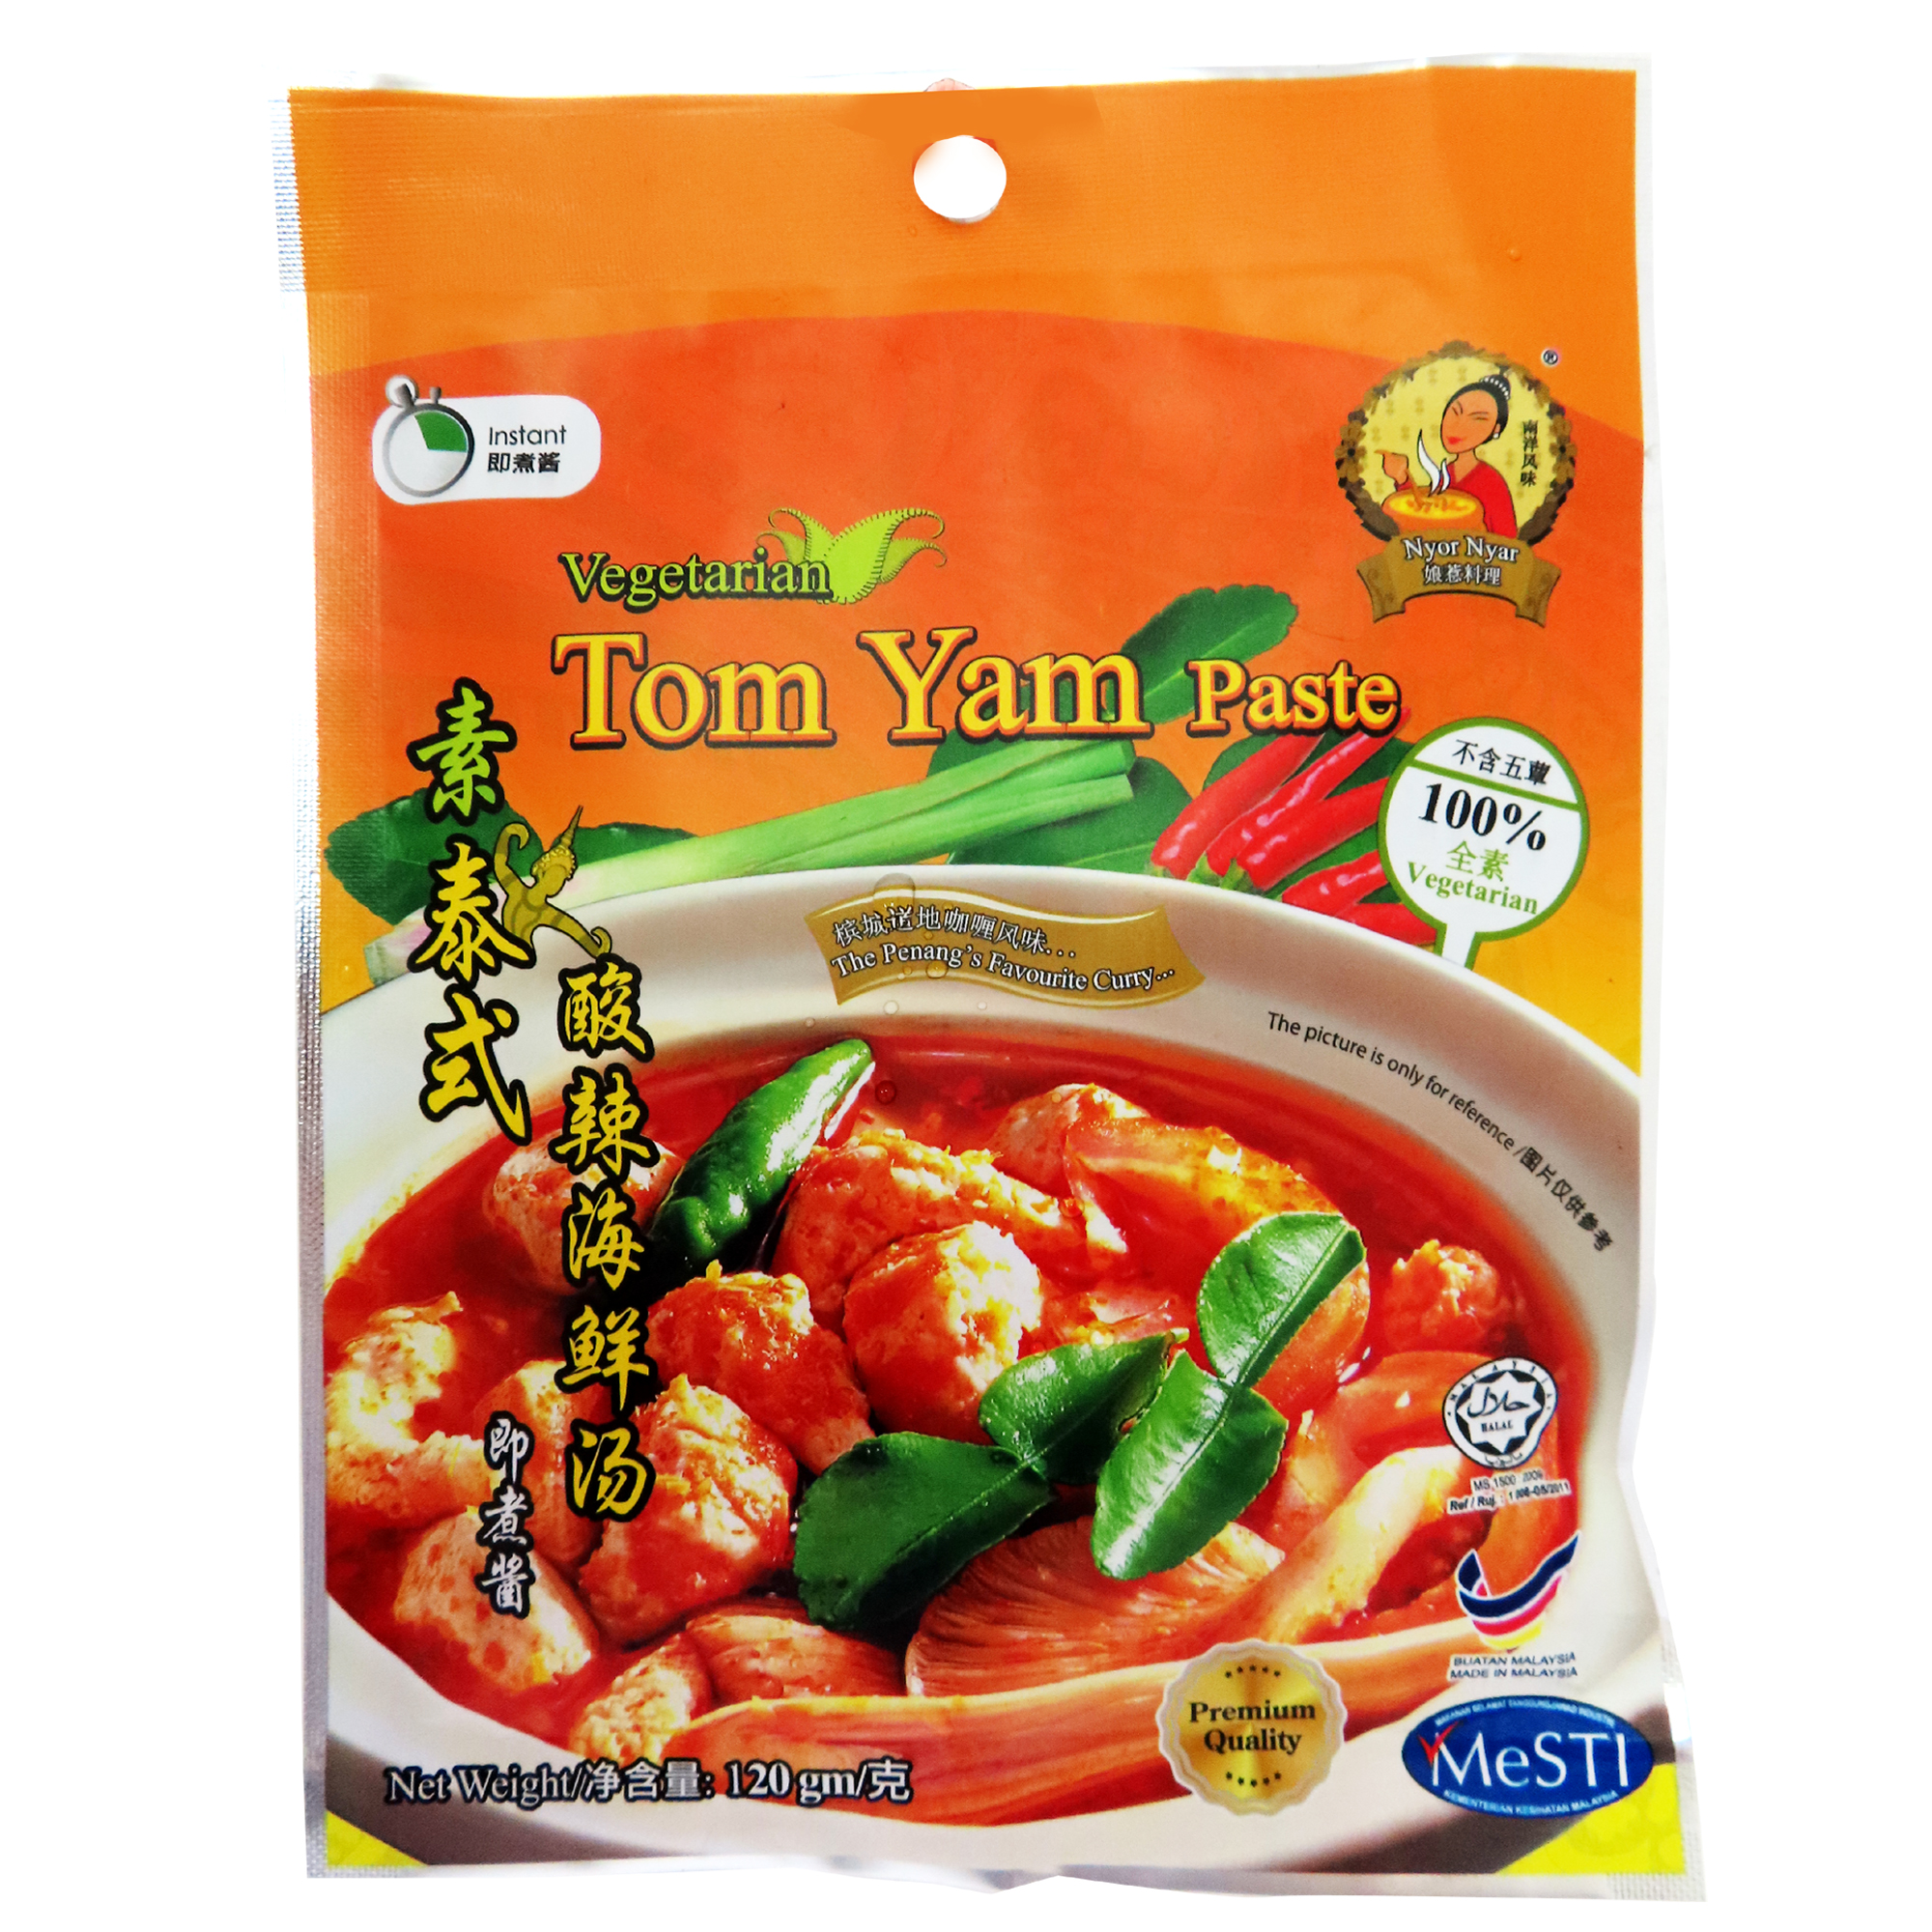 Image TomYam Paste 娘惹 - 泰式酸辣海鲜汤即煮酱 120grams